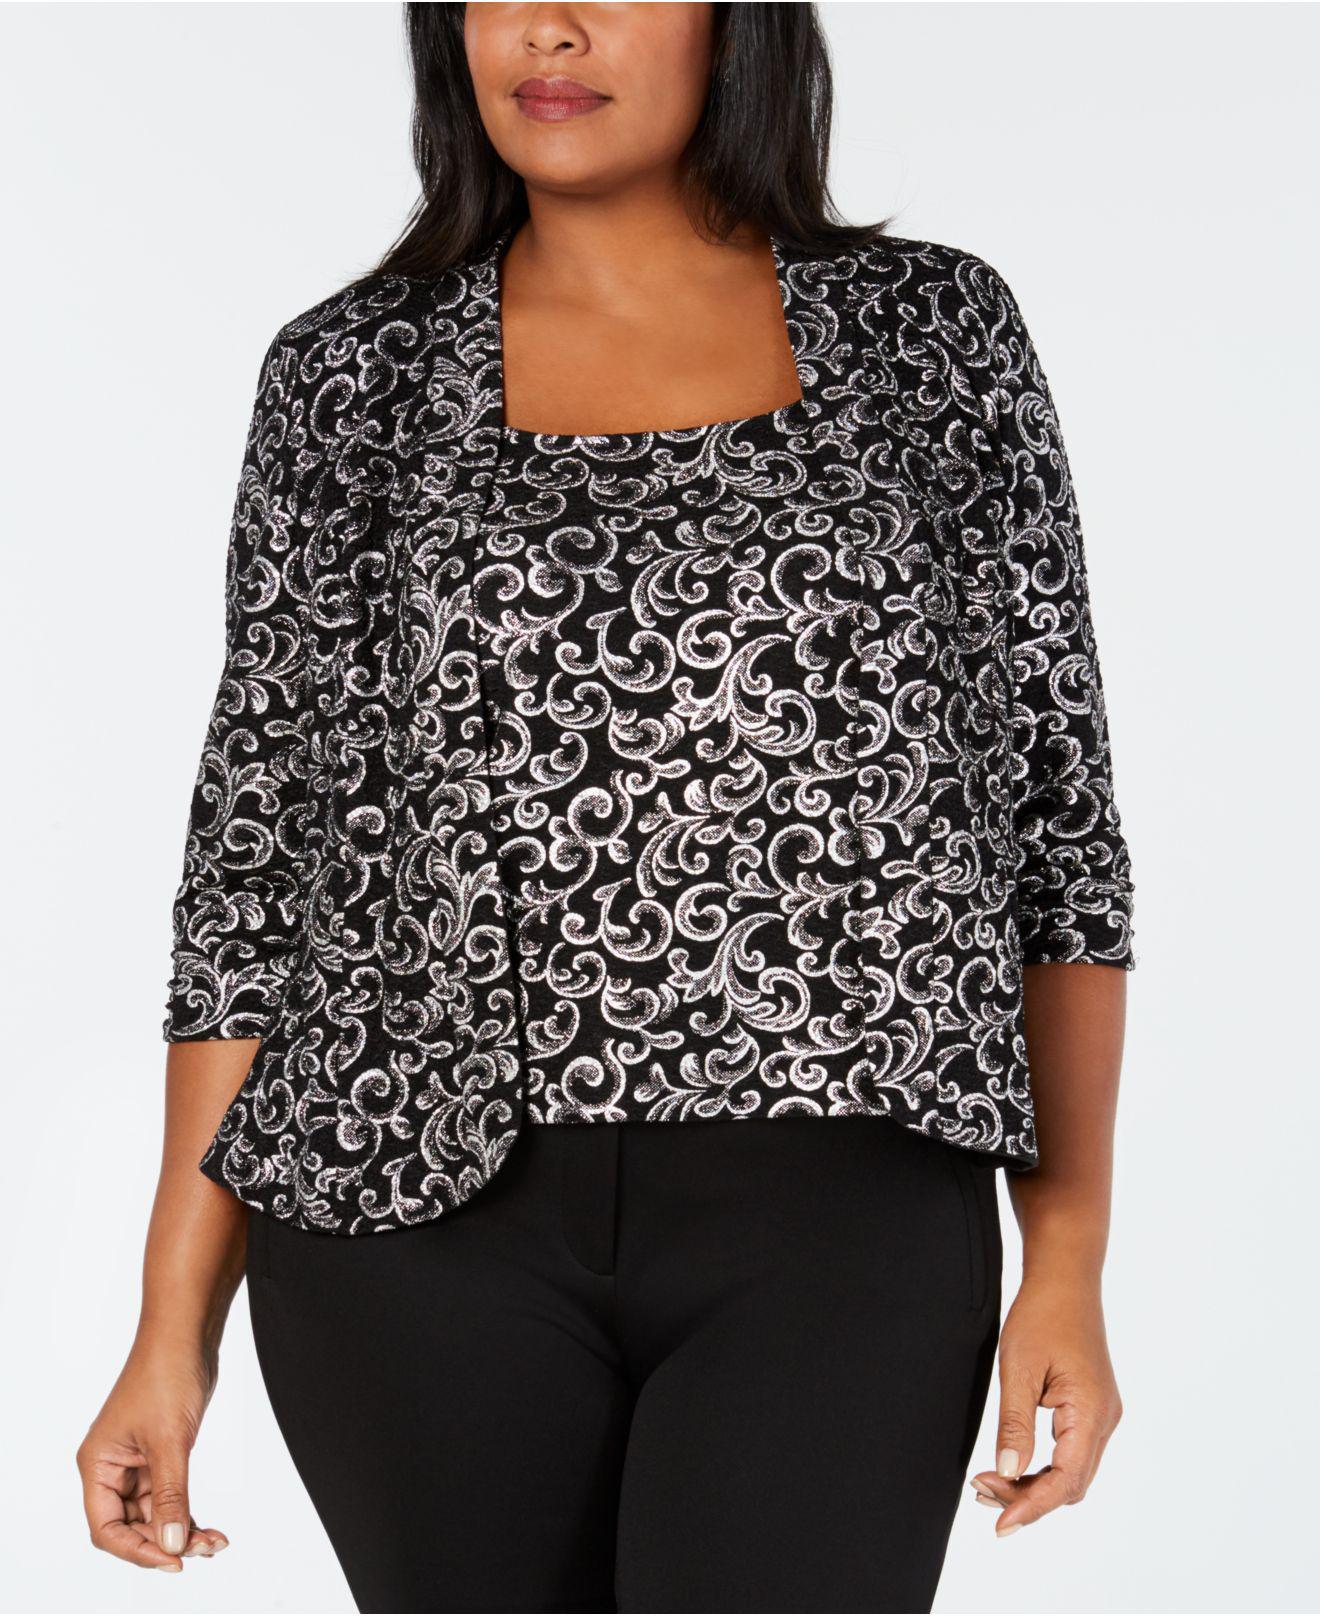 8e311c7c1fe Lyst - Alex Evenings Plus Size Glitter Print Jacket   Top Set in Black